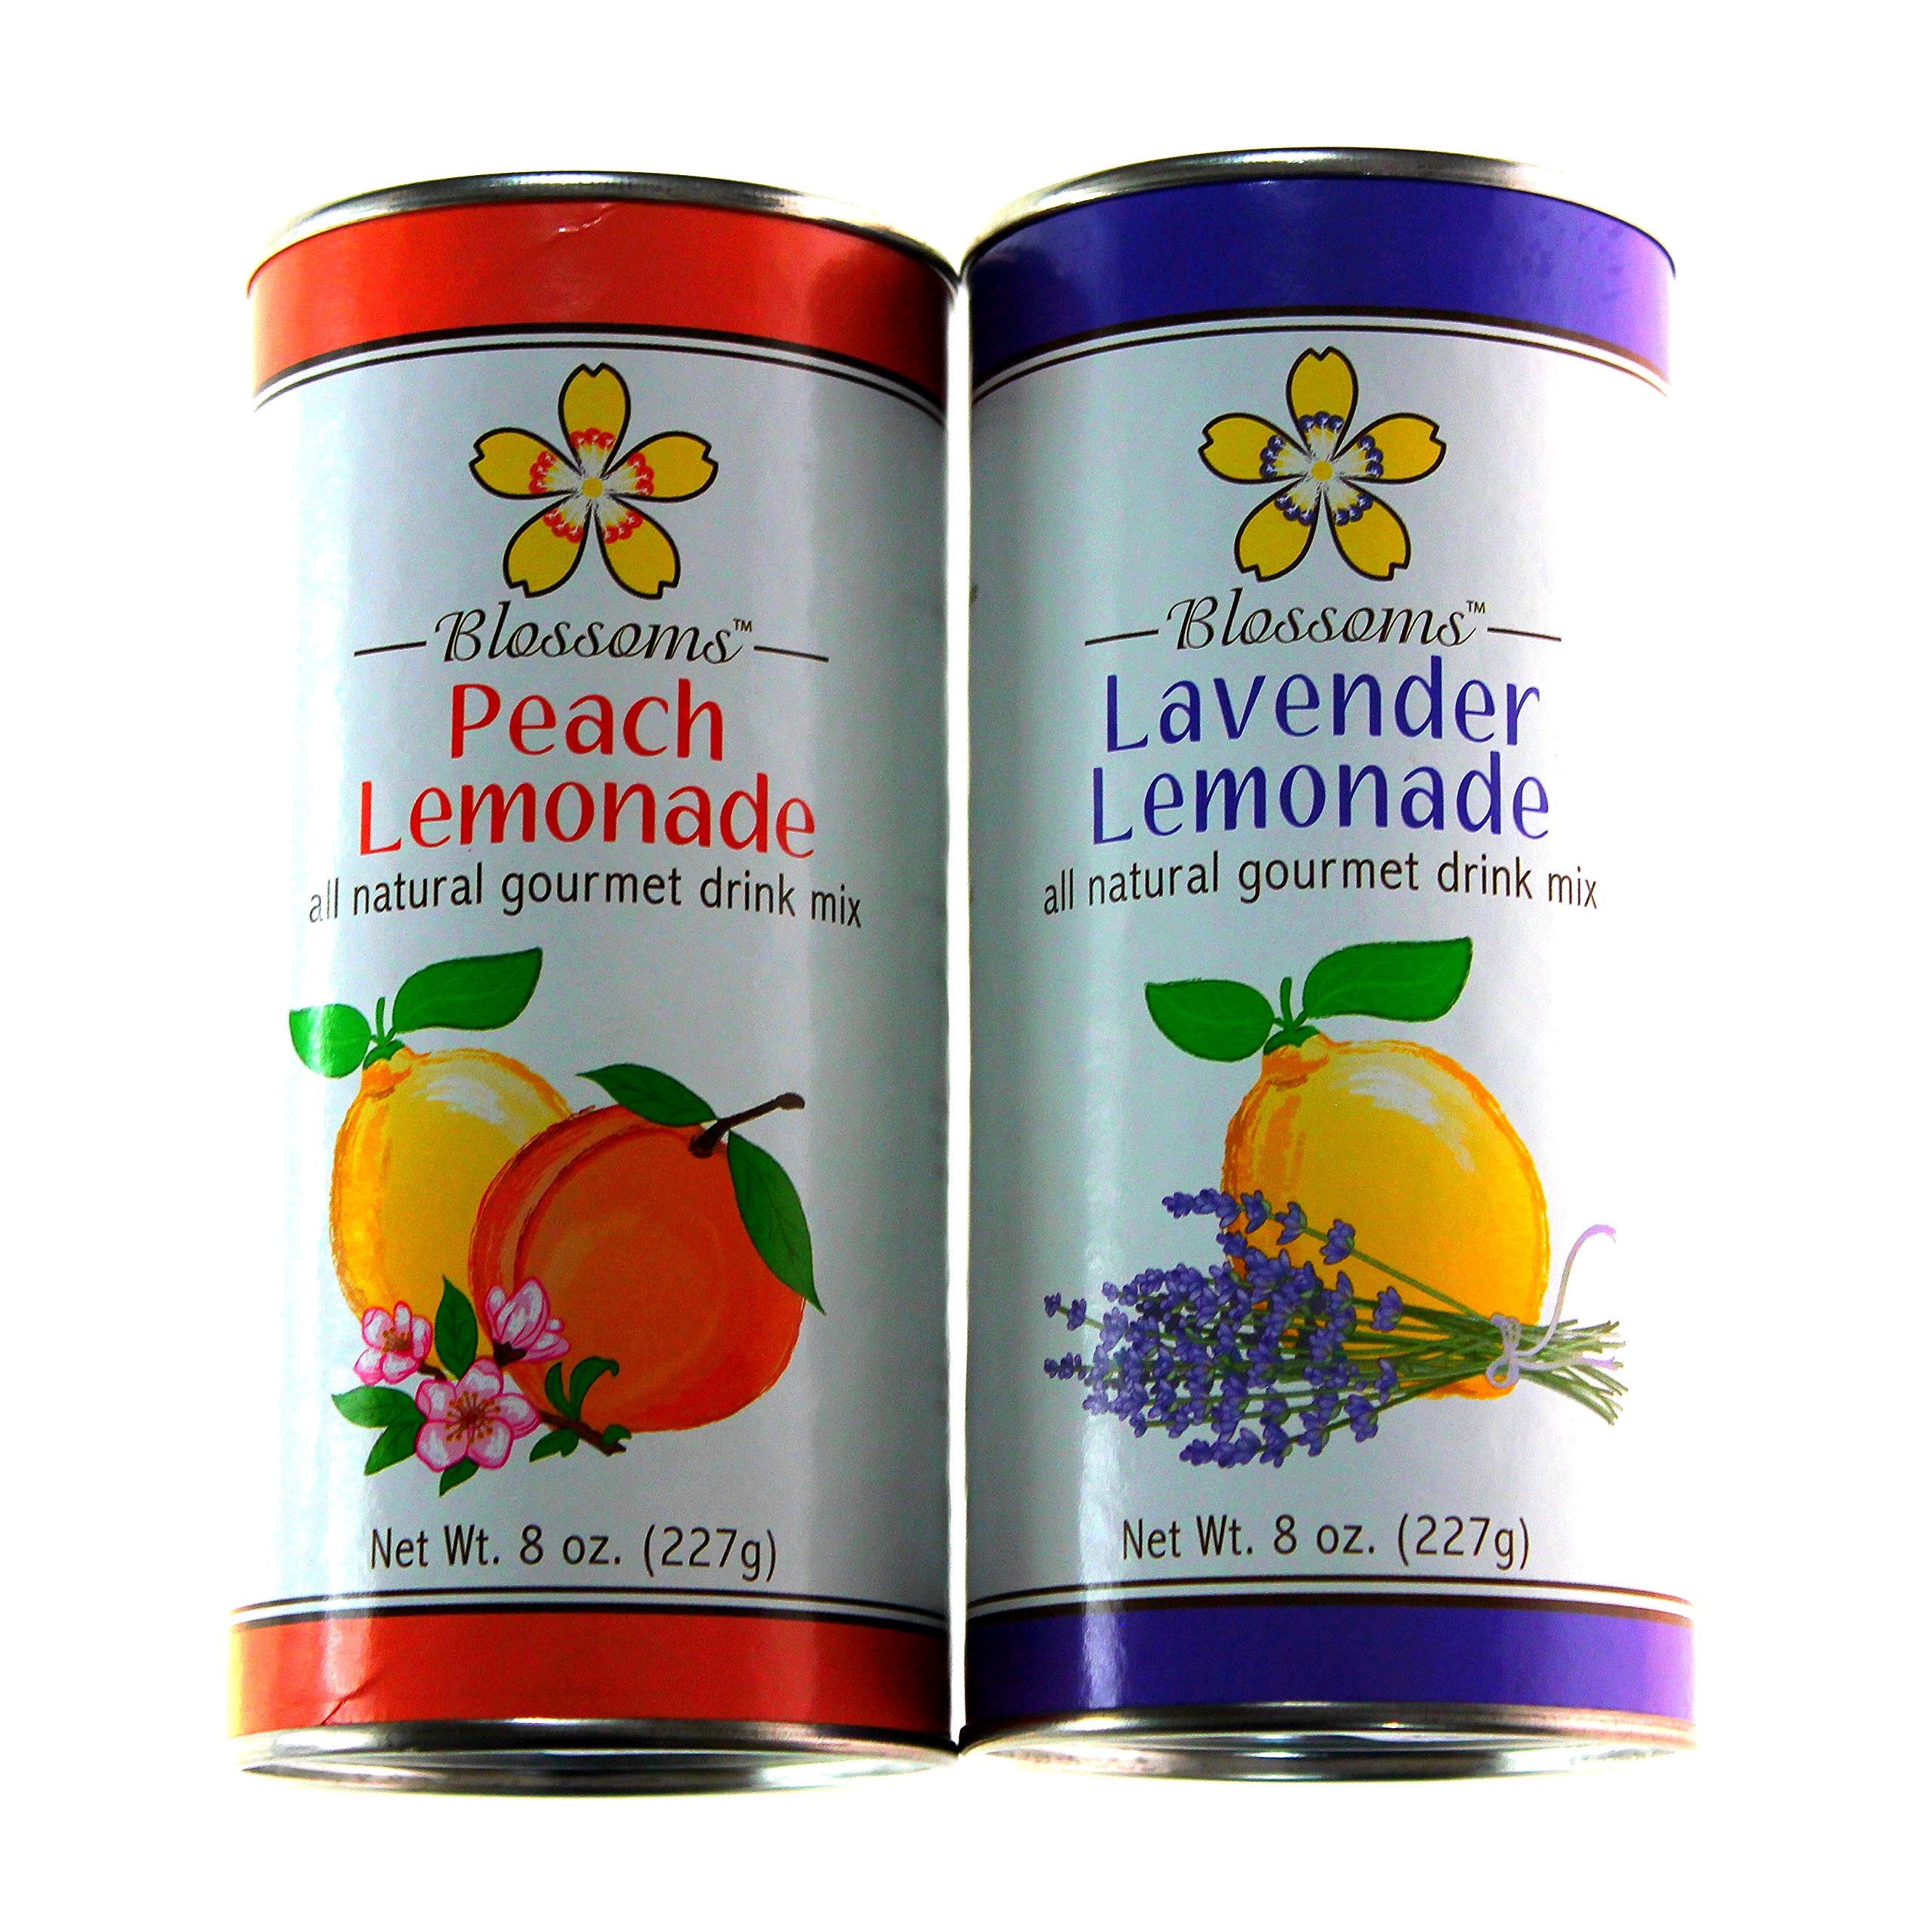 Peach and Lavender Gourmet Lemonade Variety Pack, 8 oz. each by Blossoms Peach and Lavender Lemonade (Image #1)